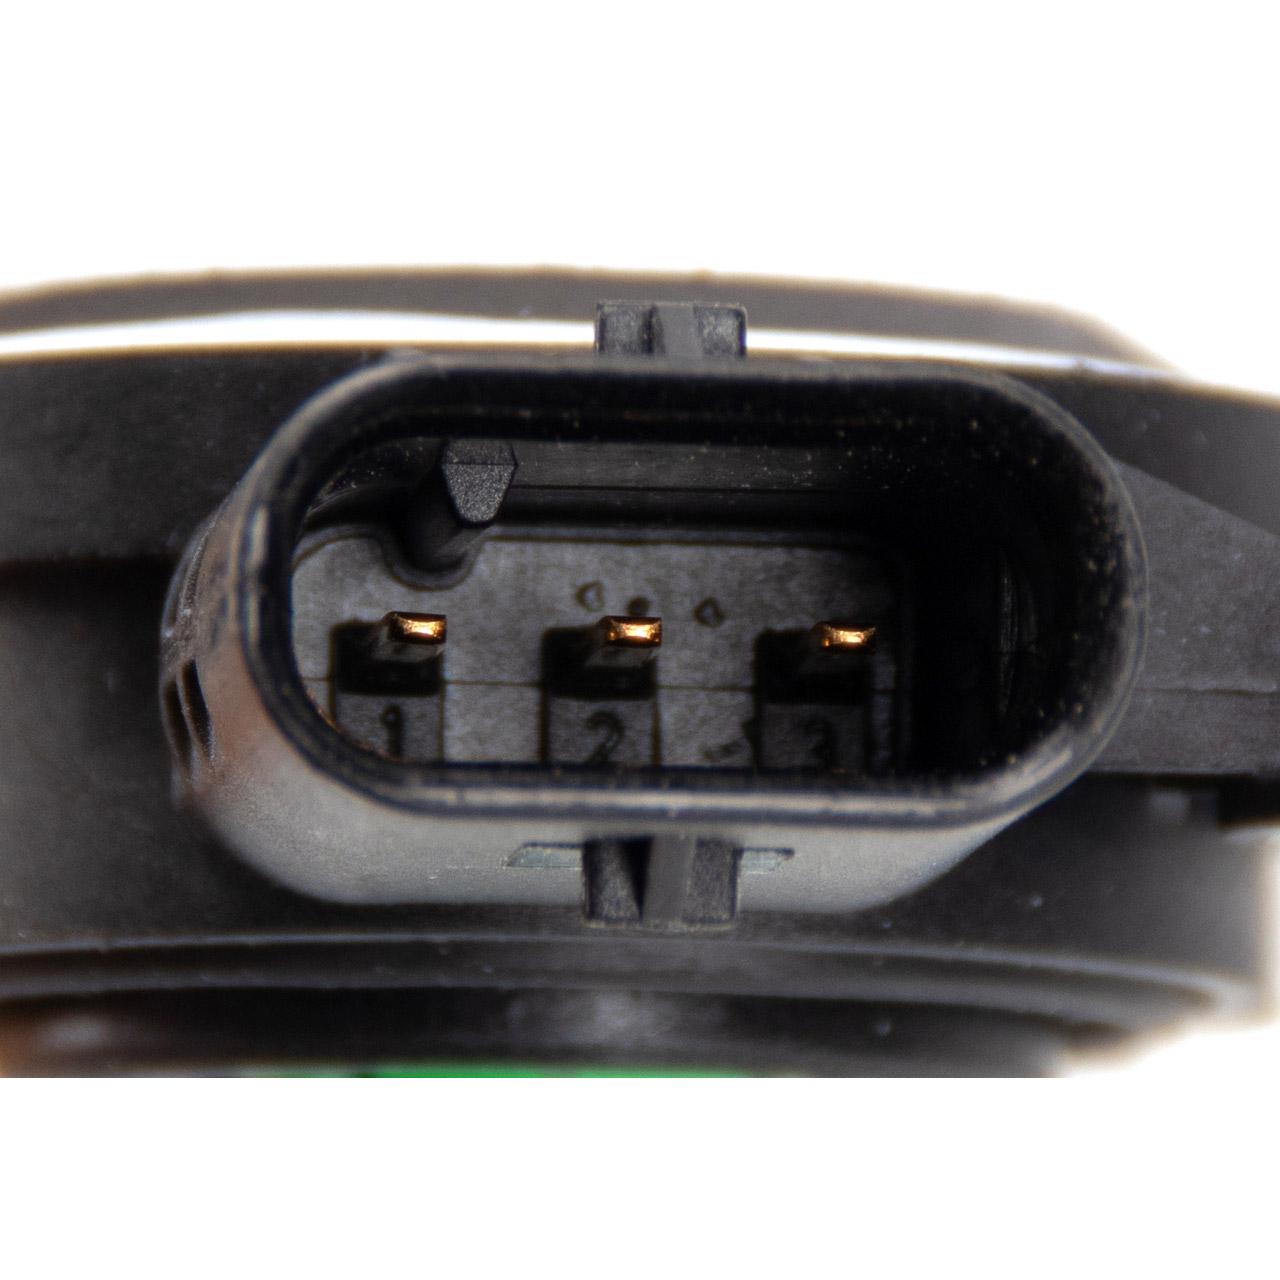 METZGER 0906199 Sensor Saugrohrklappe AUDI A3 A4 A6 VW Golf 5 6 Passat 1.8 2.0 07L907386B